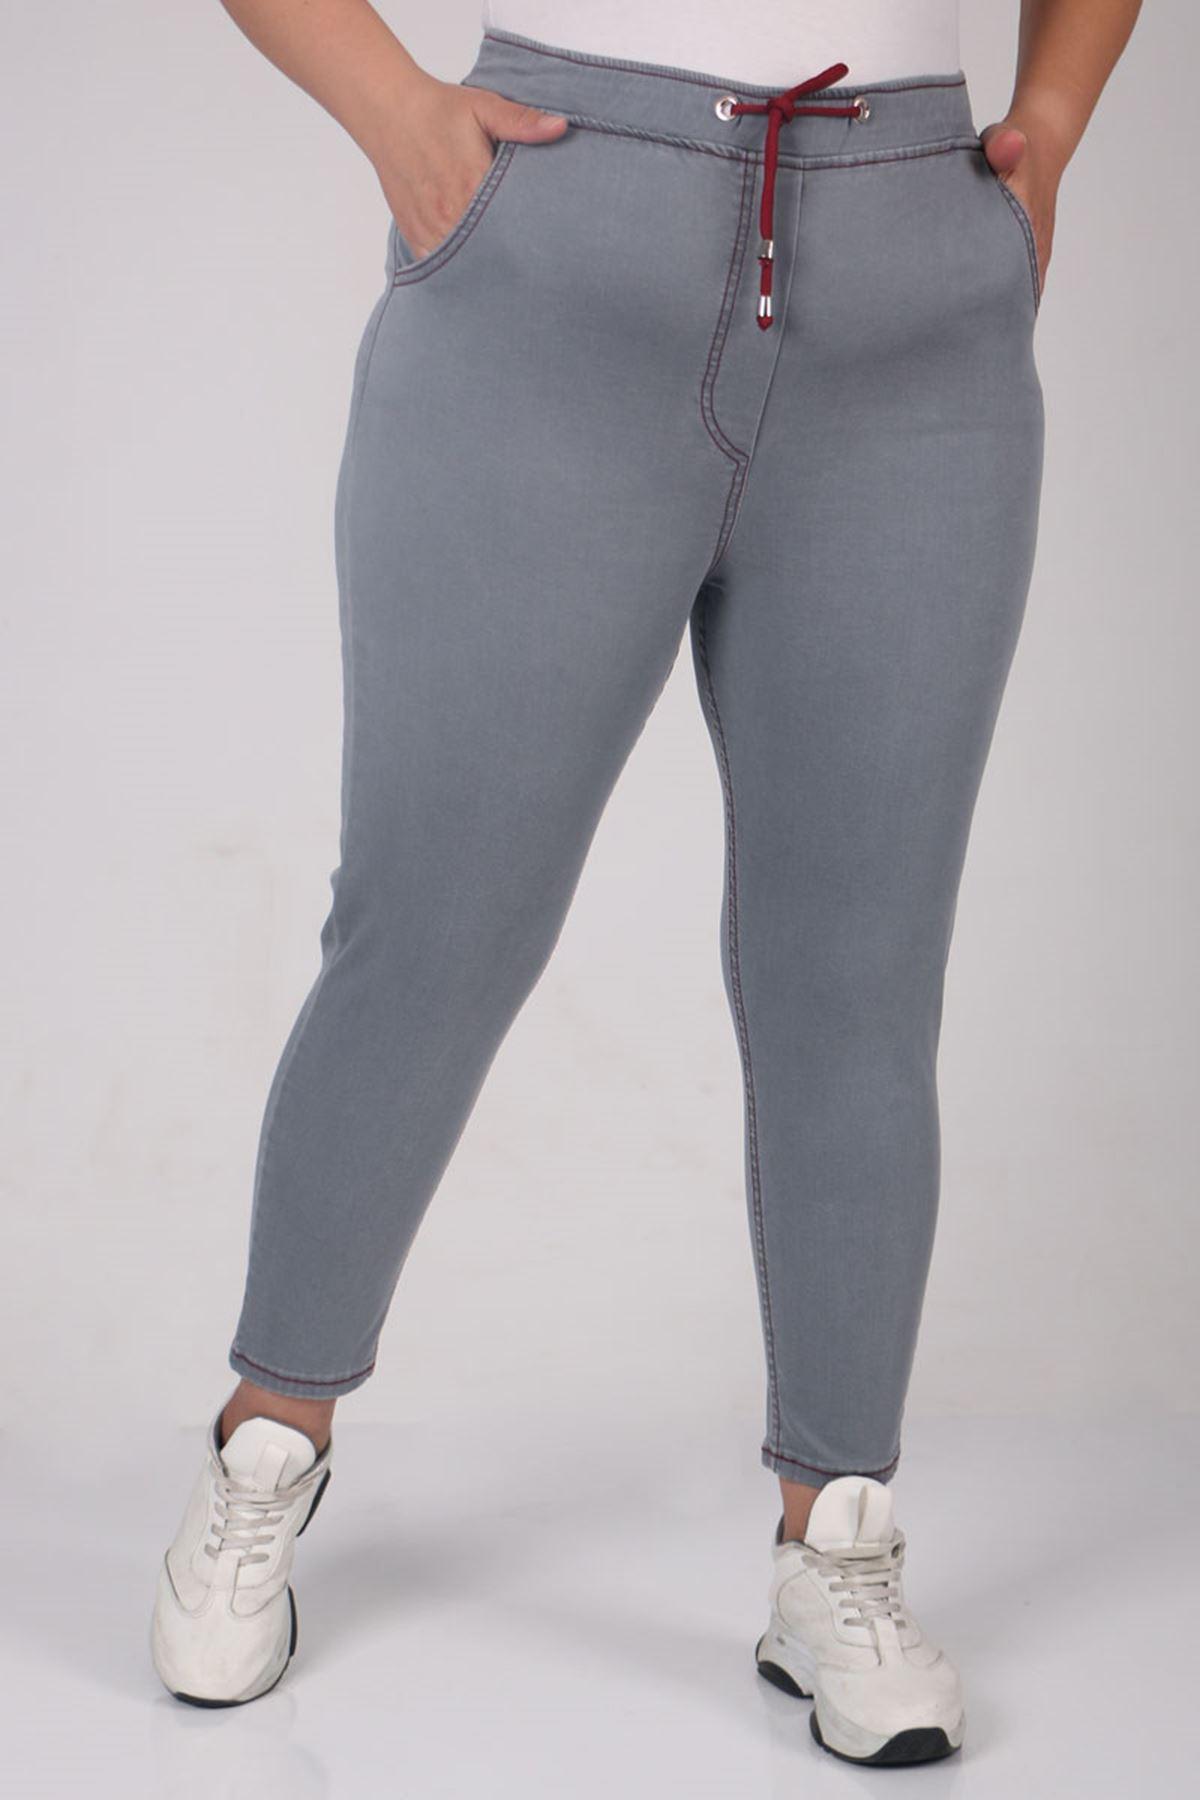 D-9136-1-1 Büyük Beden Beli Defolu Lastikli Mom Jeans Pantolon - Bordo-Gri